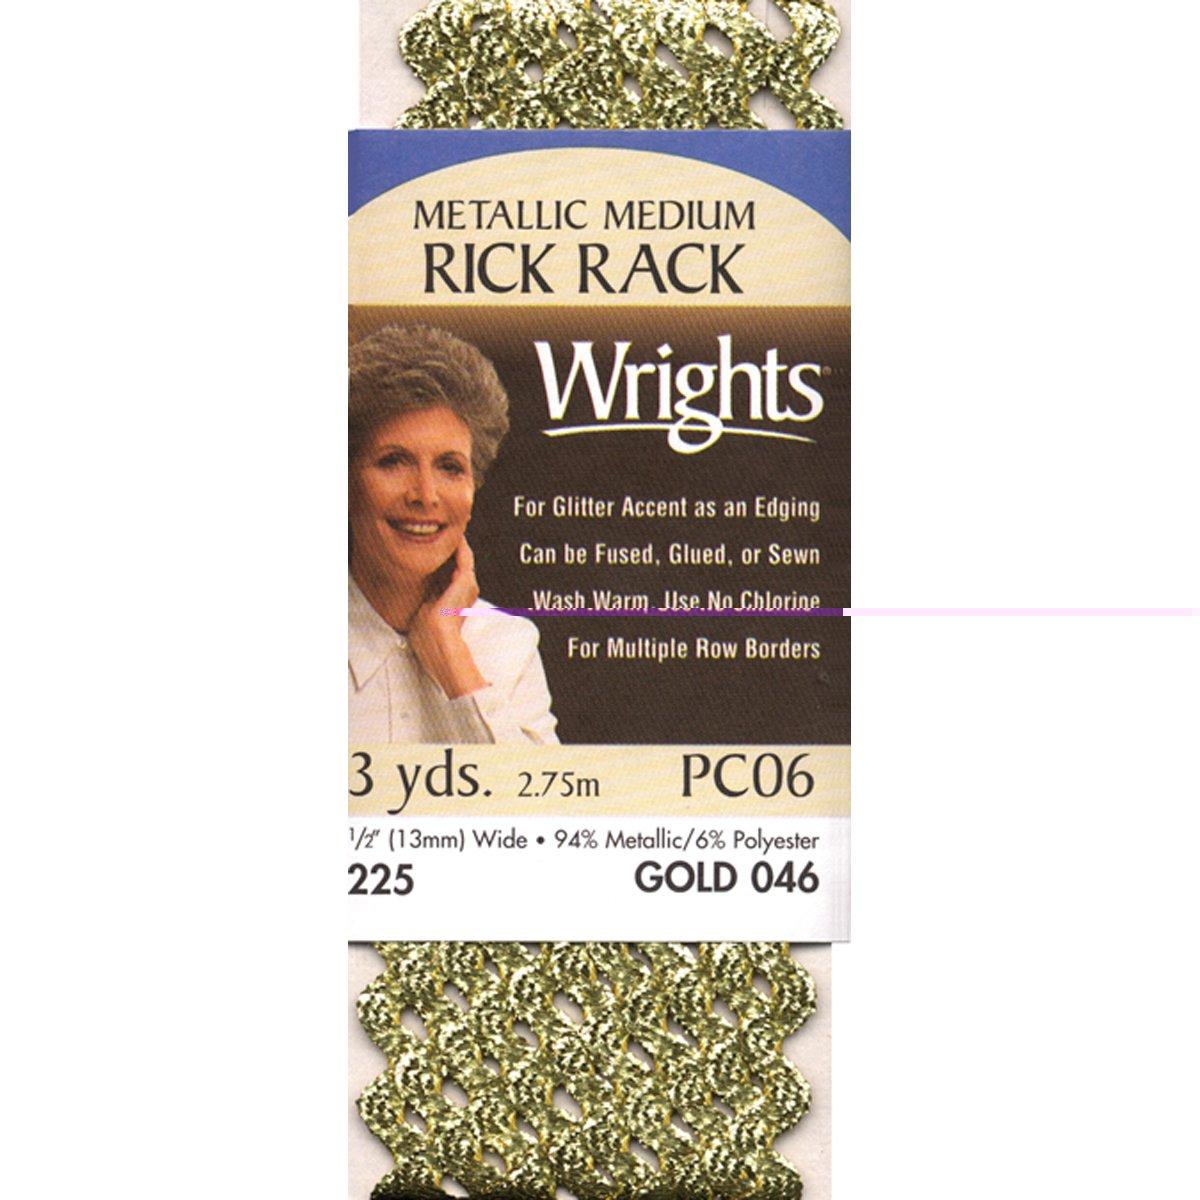 Wrights 117-225-070 Medium Metallic Rick Rack, Silver, 3 yd Notions - In Network